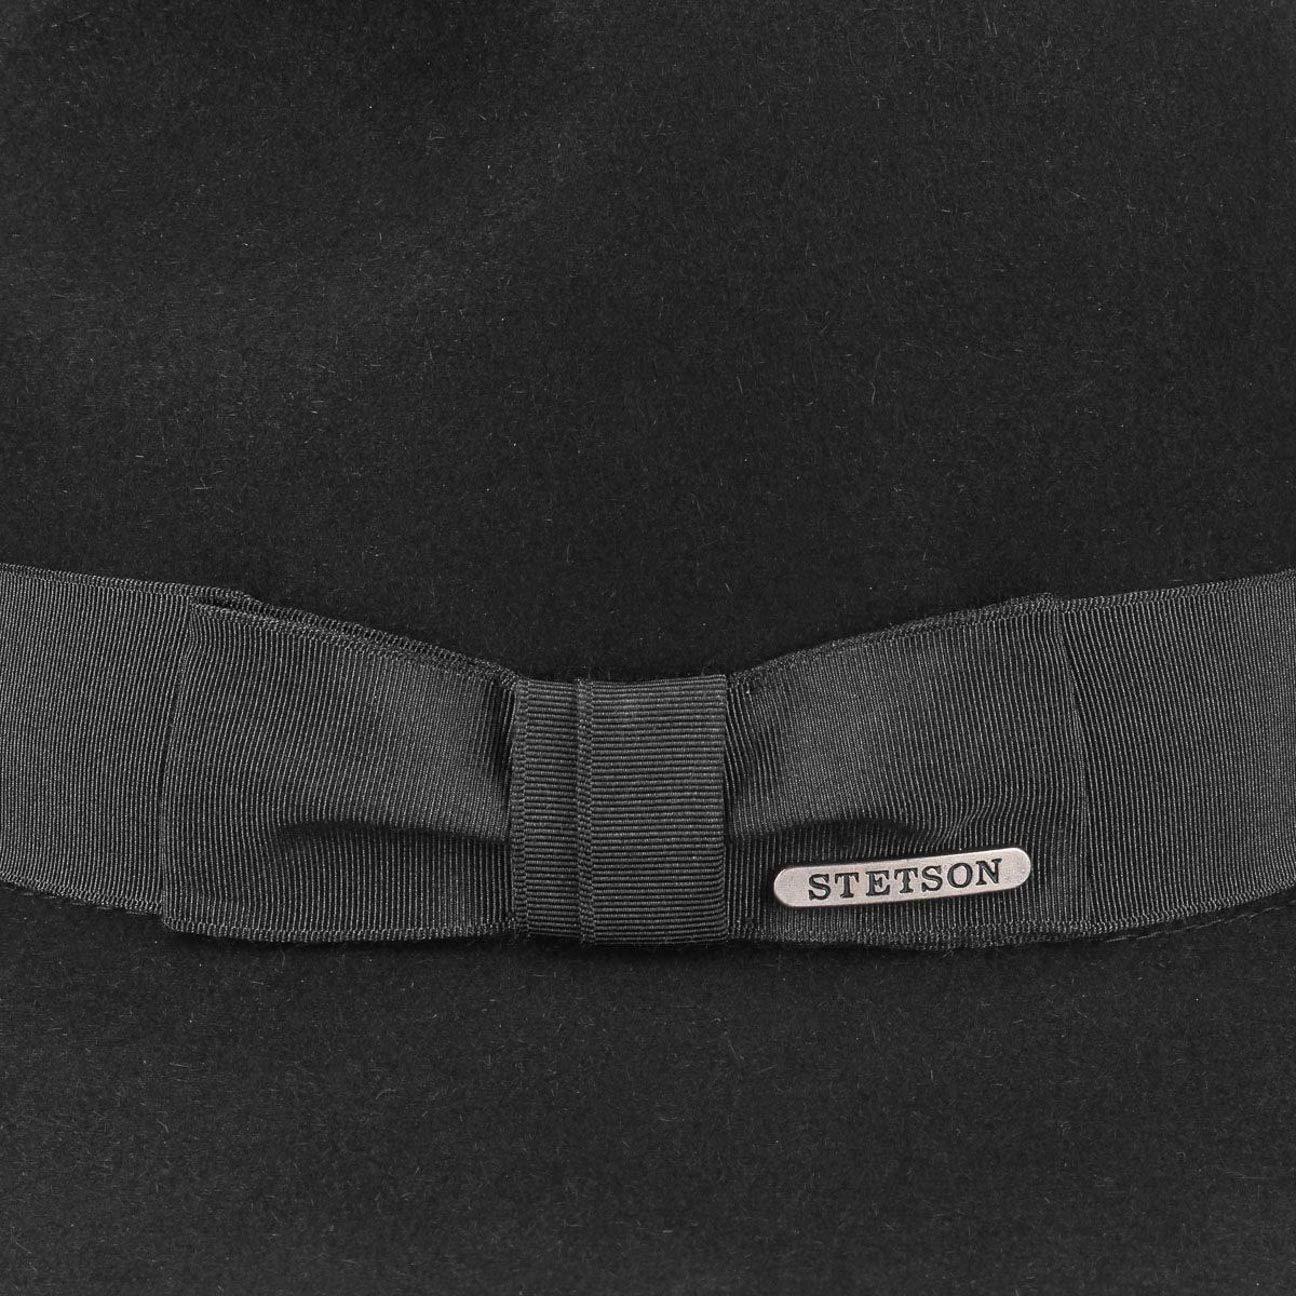 Stetson Sombrero Fieltro de Pelo Dalion Mujer//Hombre Made in The EU Hombre Outdoor con Banda Grosgrain Verano//Invierno